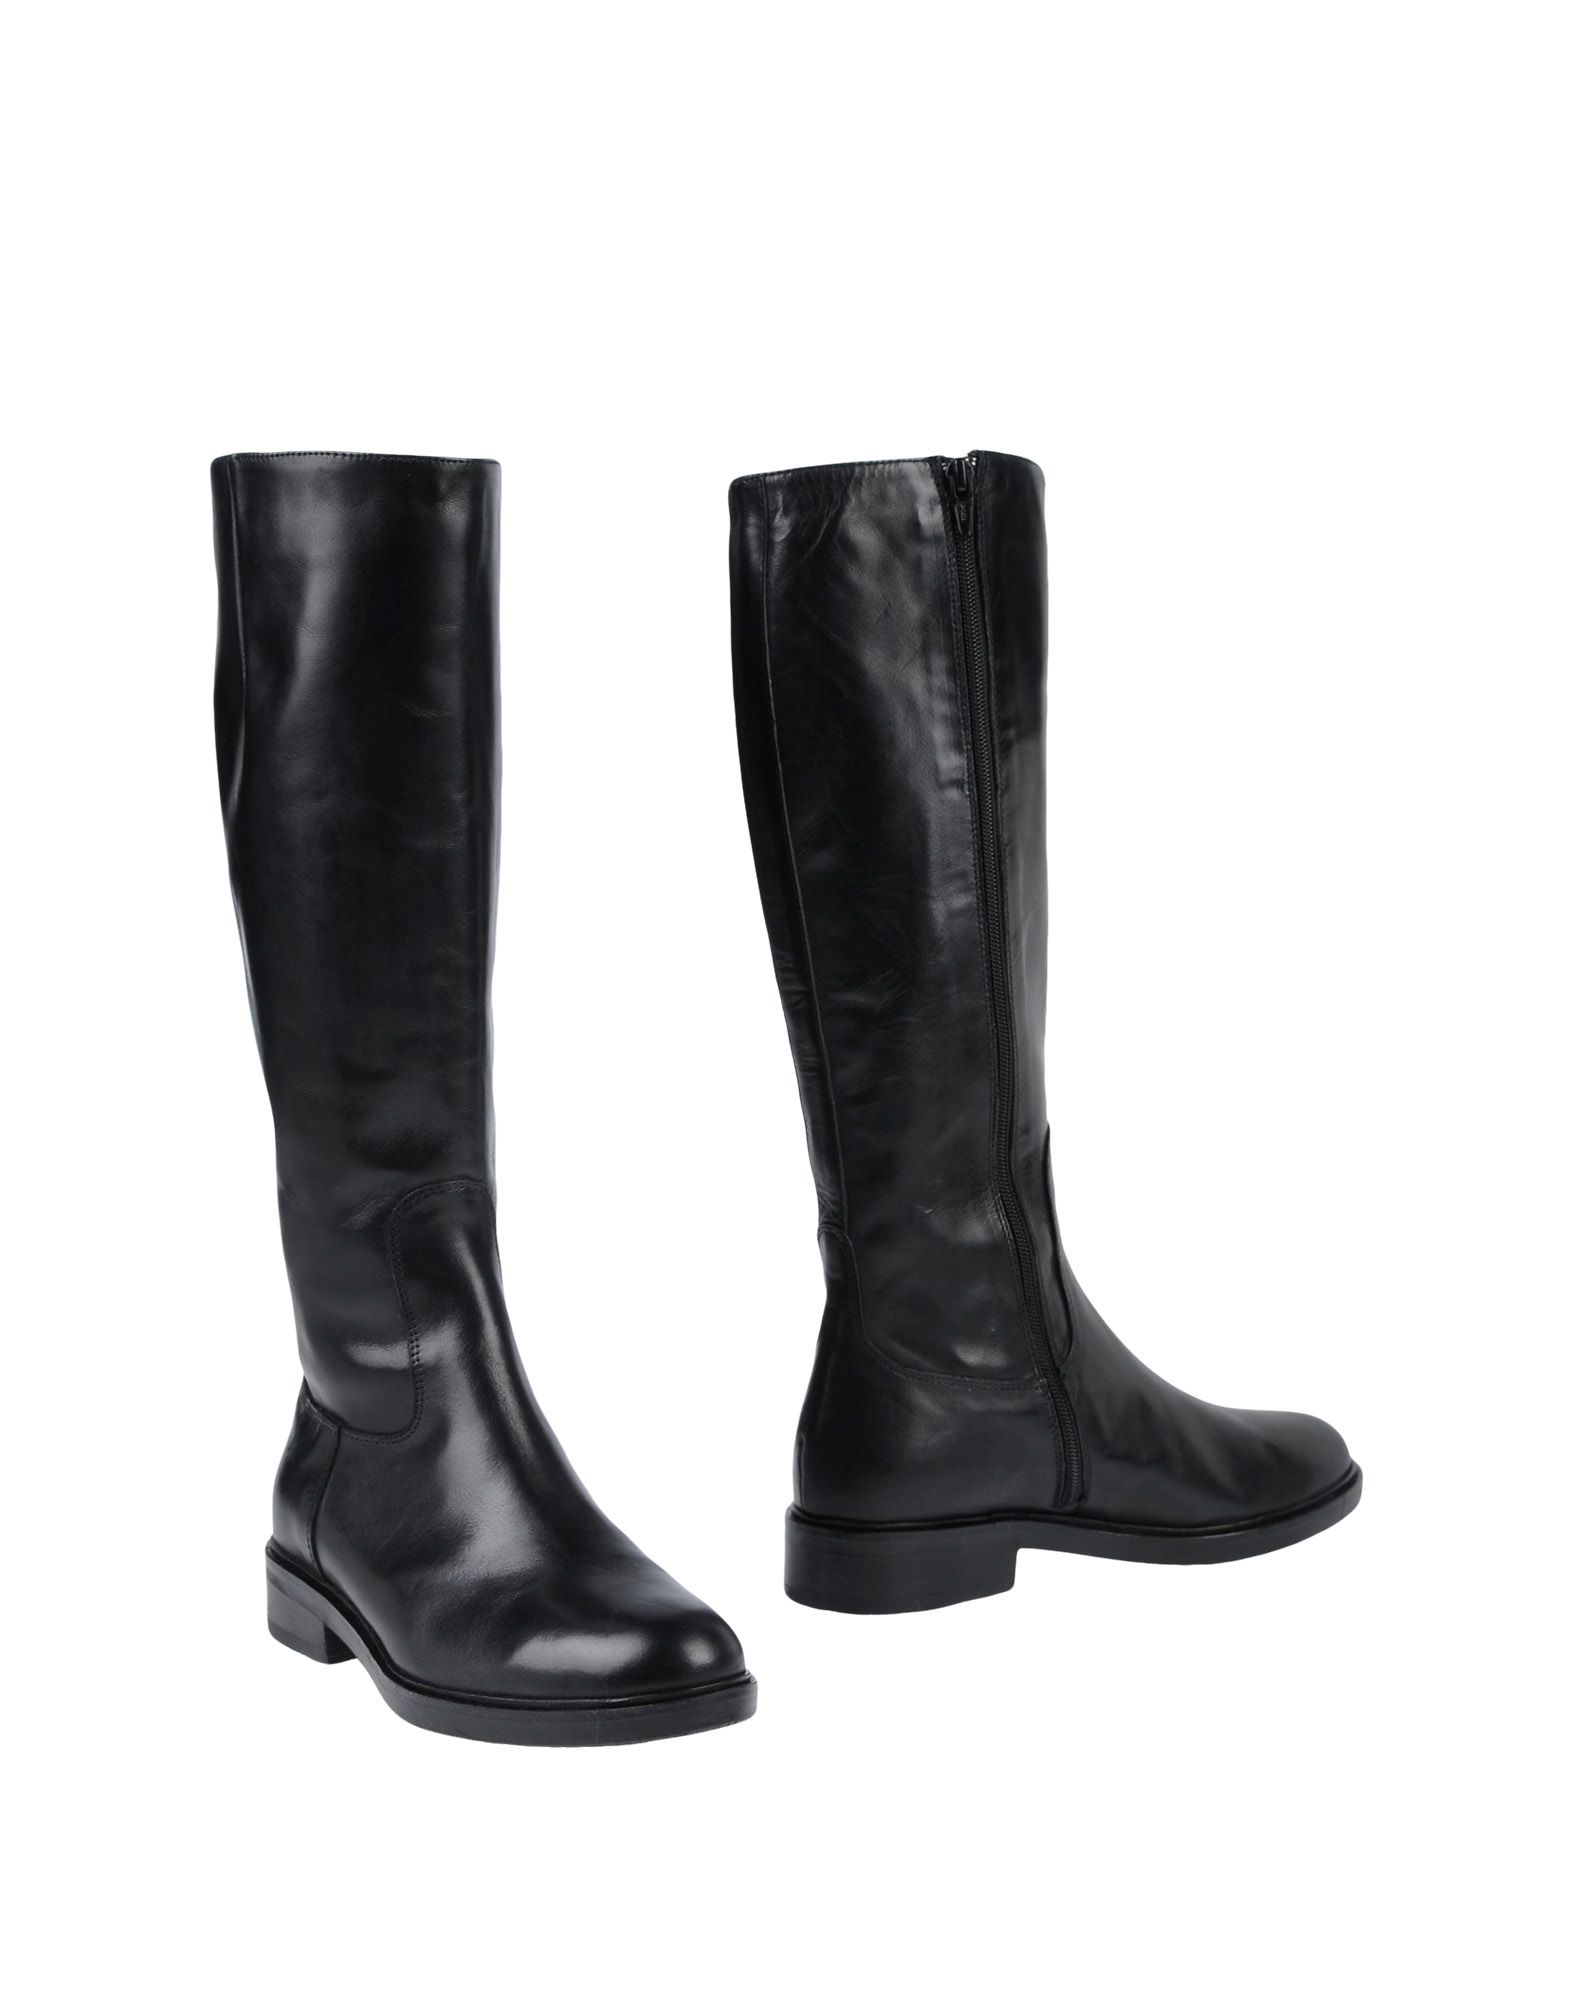 Silvia Carasi Stiefel Damen  11458430XF Gute Qualität beliebte Schuhe